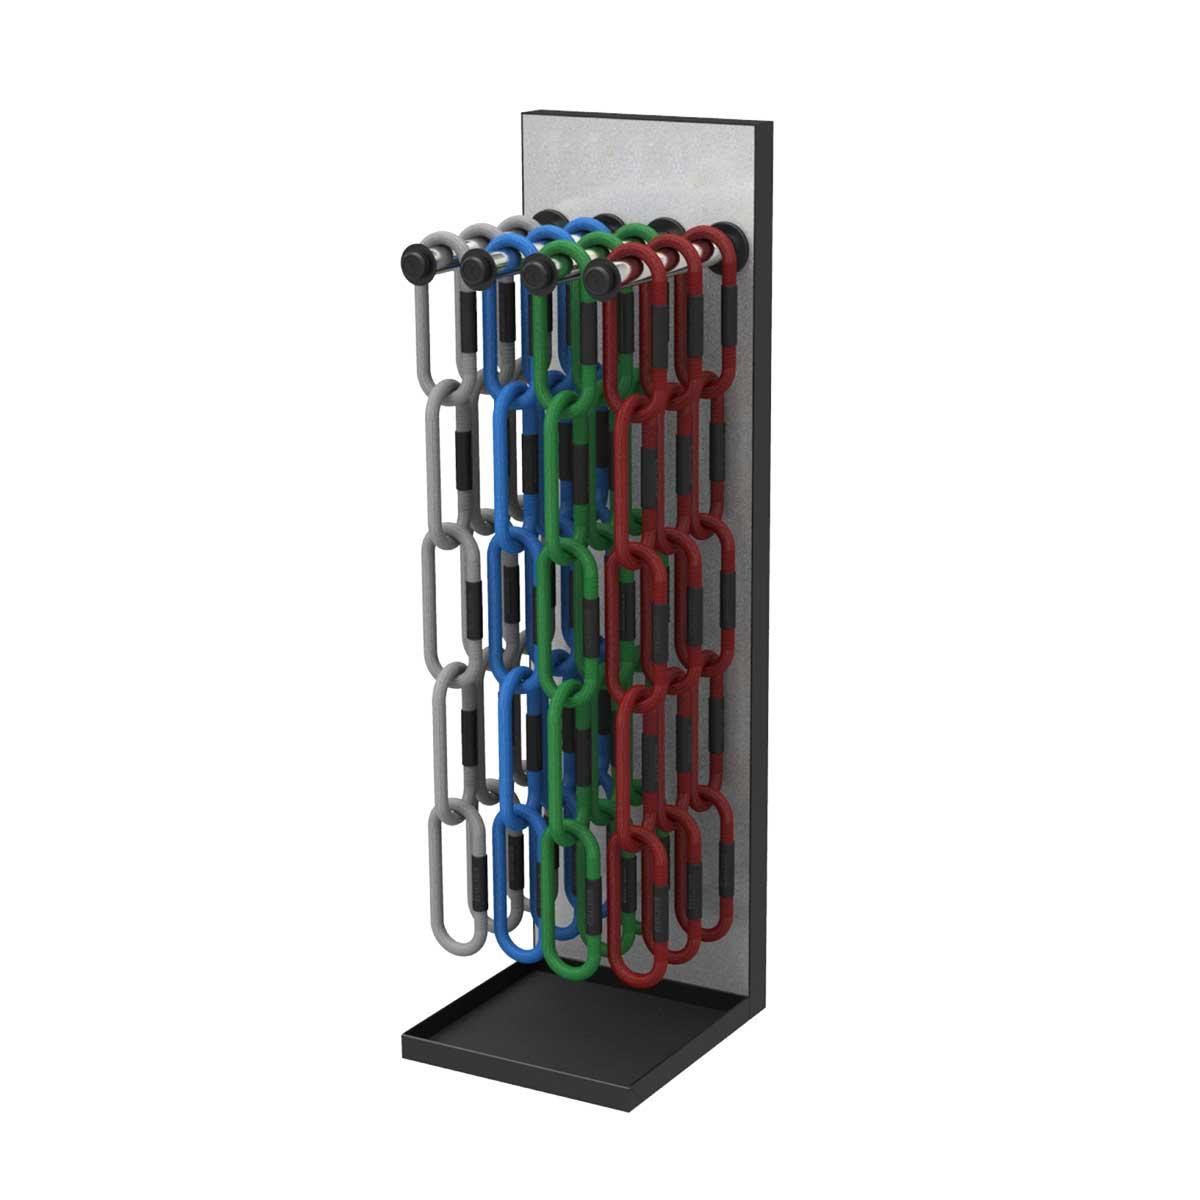 Reax Chain Five Display Storage